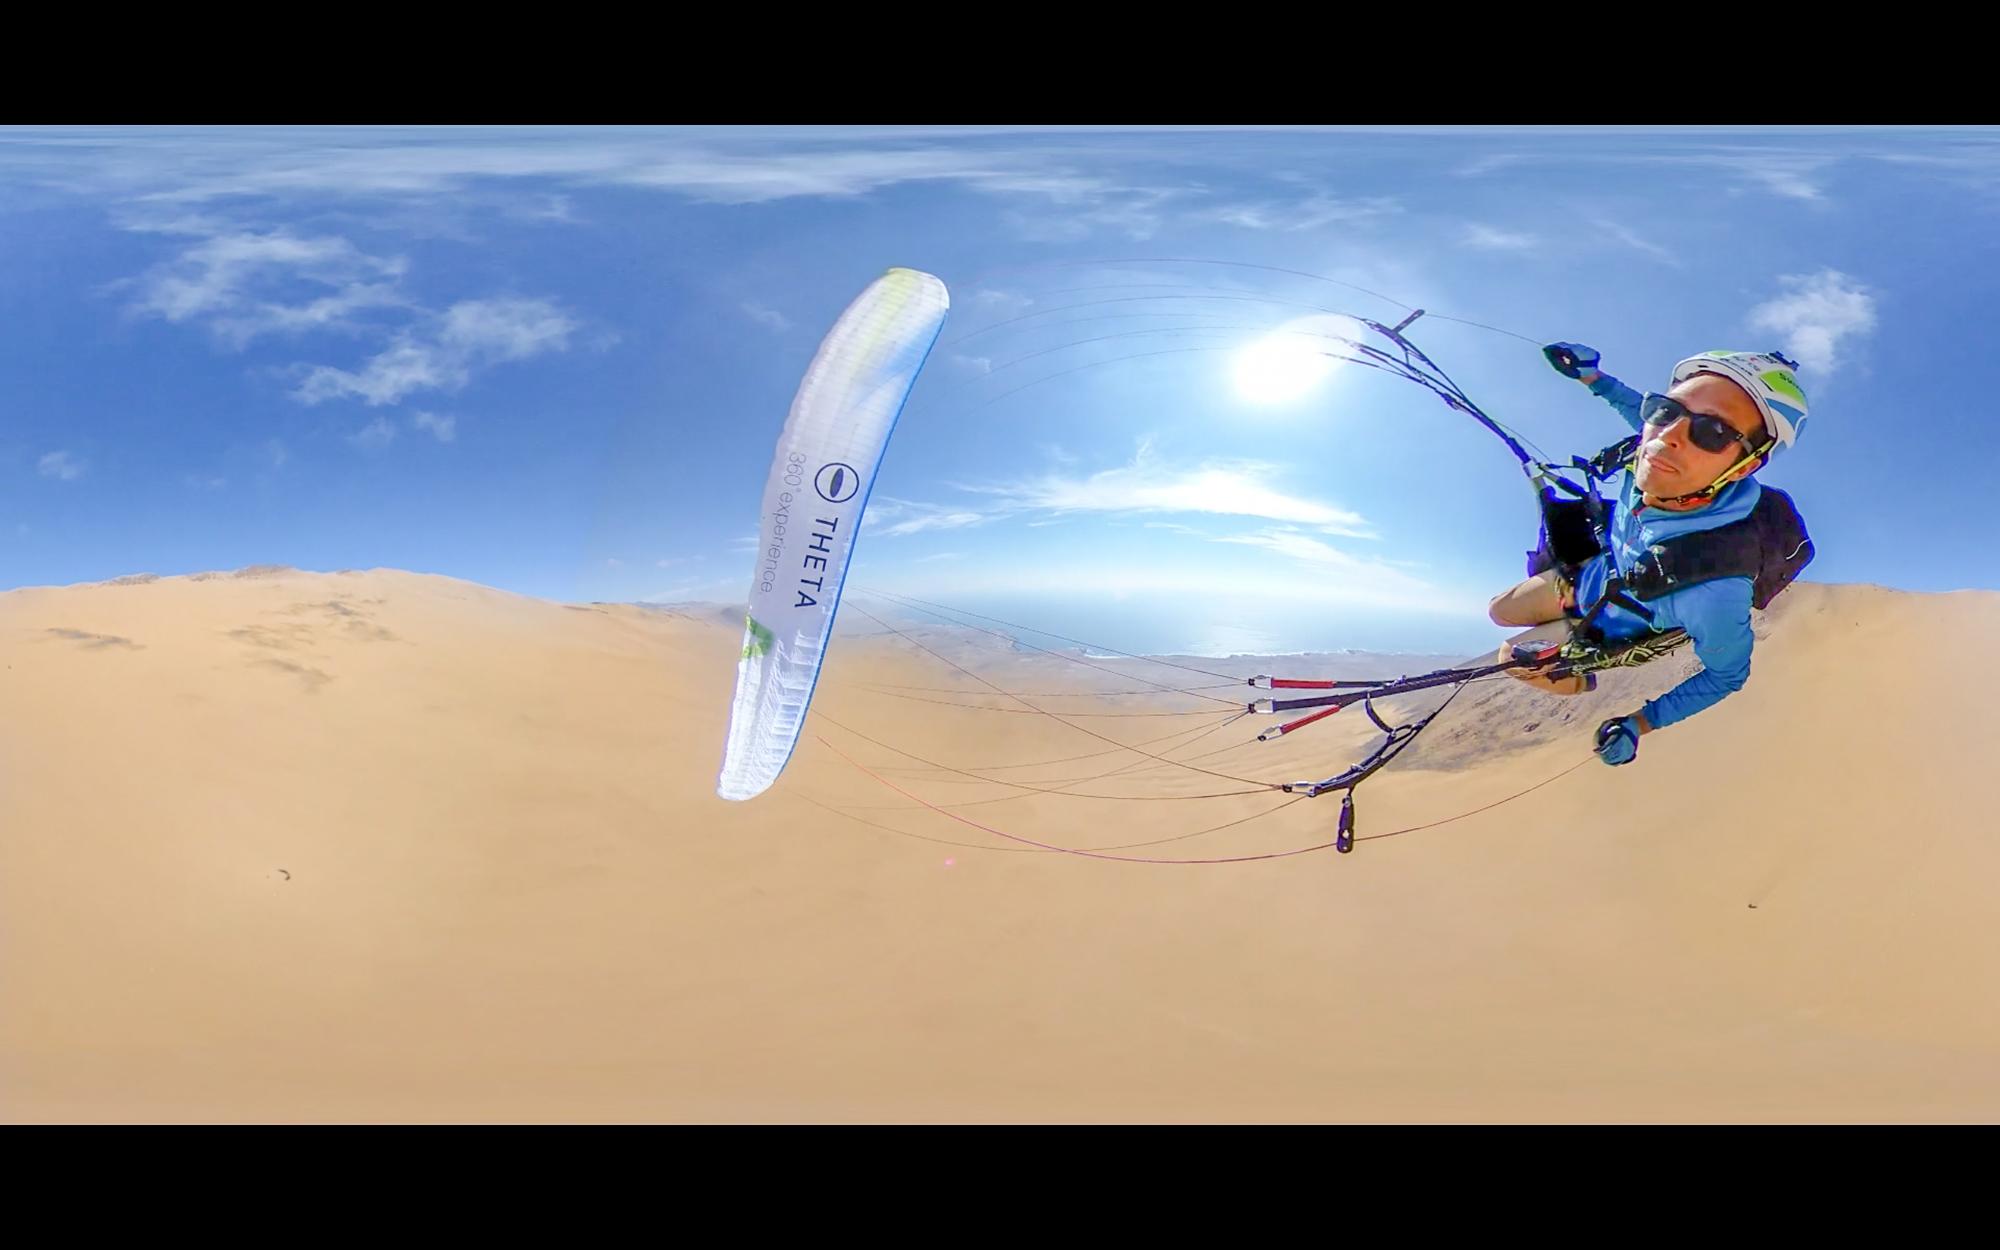 Chile Paragliding Francois ragolski Theta V Ricoh Skywalk Syride supair